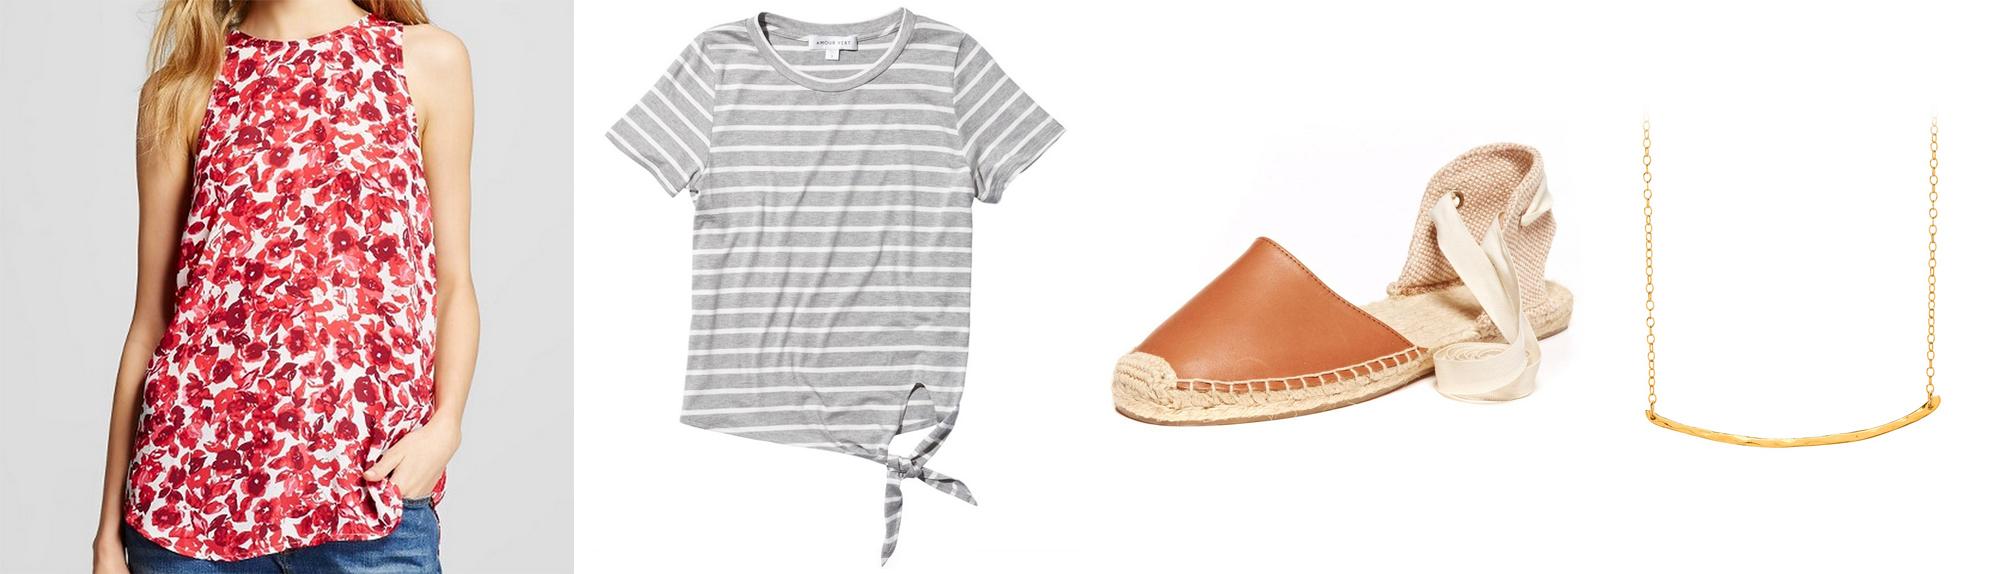 April 2016 wardrobe additions — via Cotton Cashmere Cat Hair